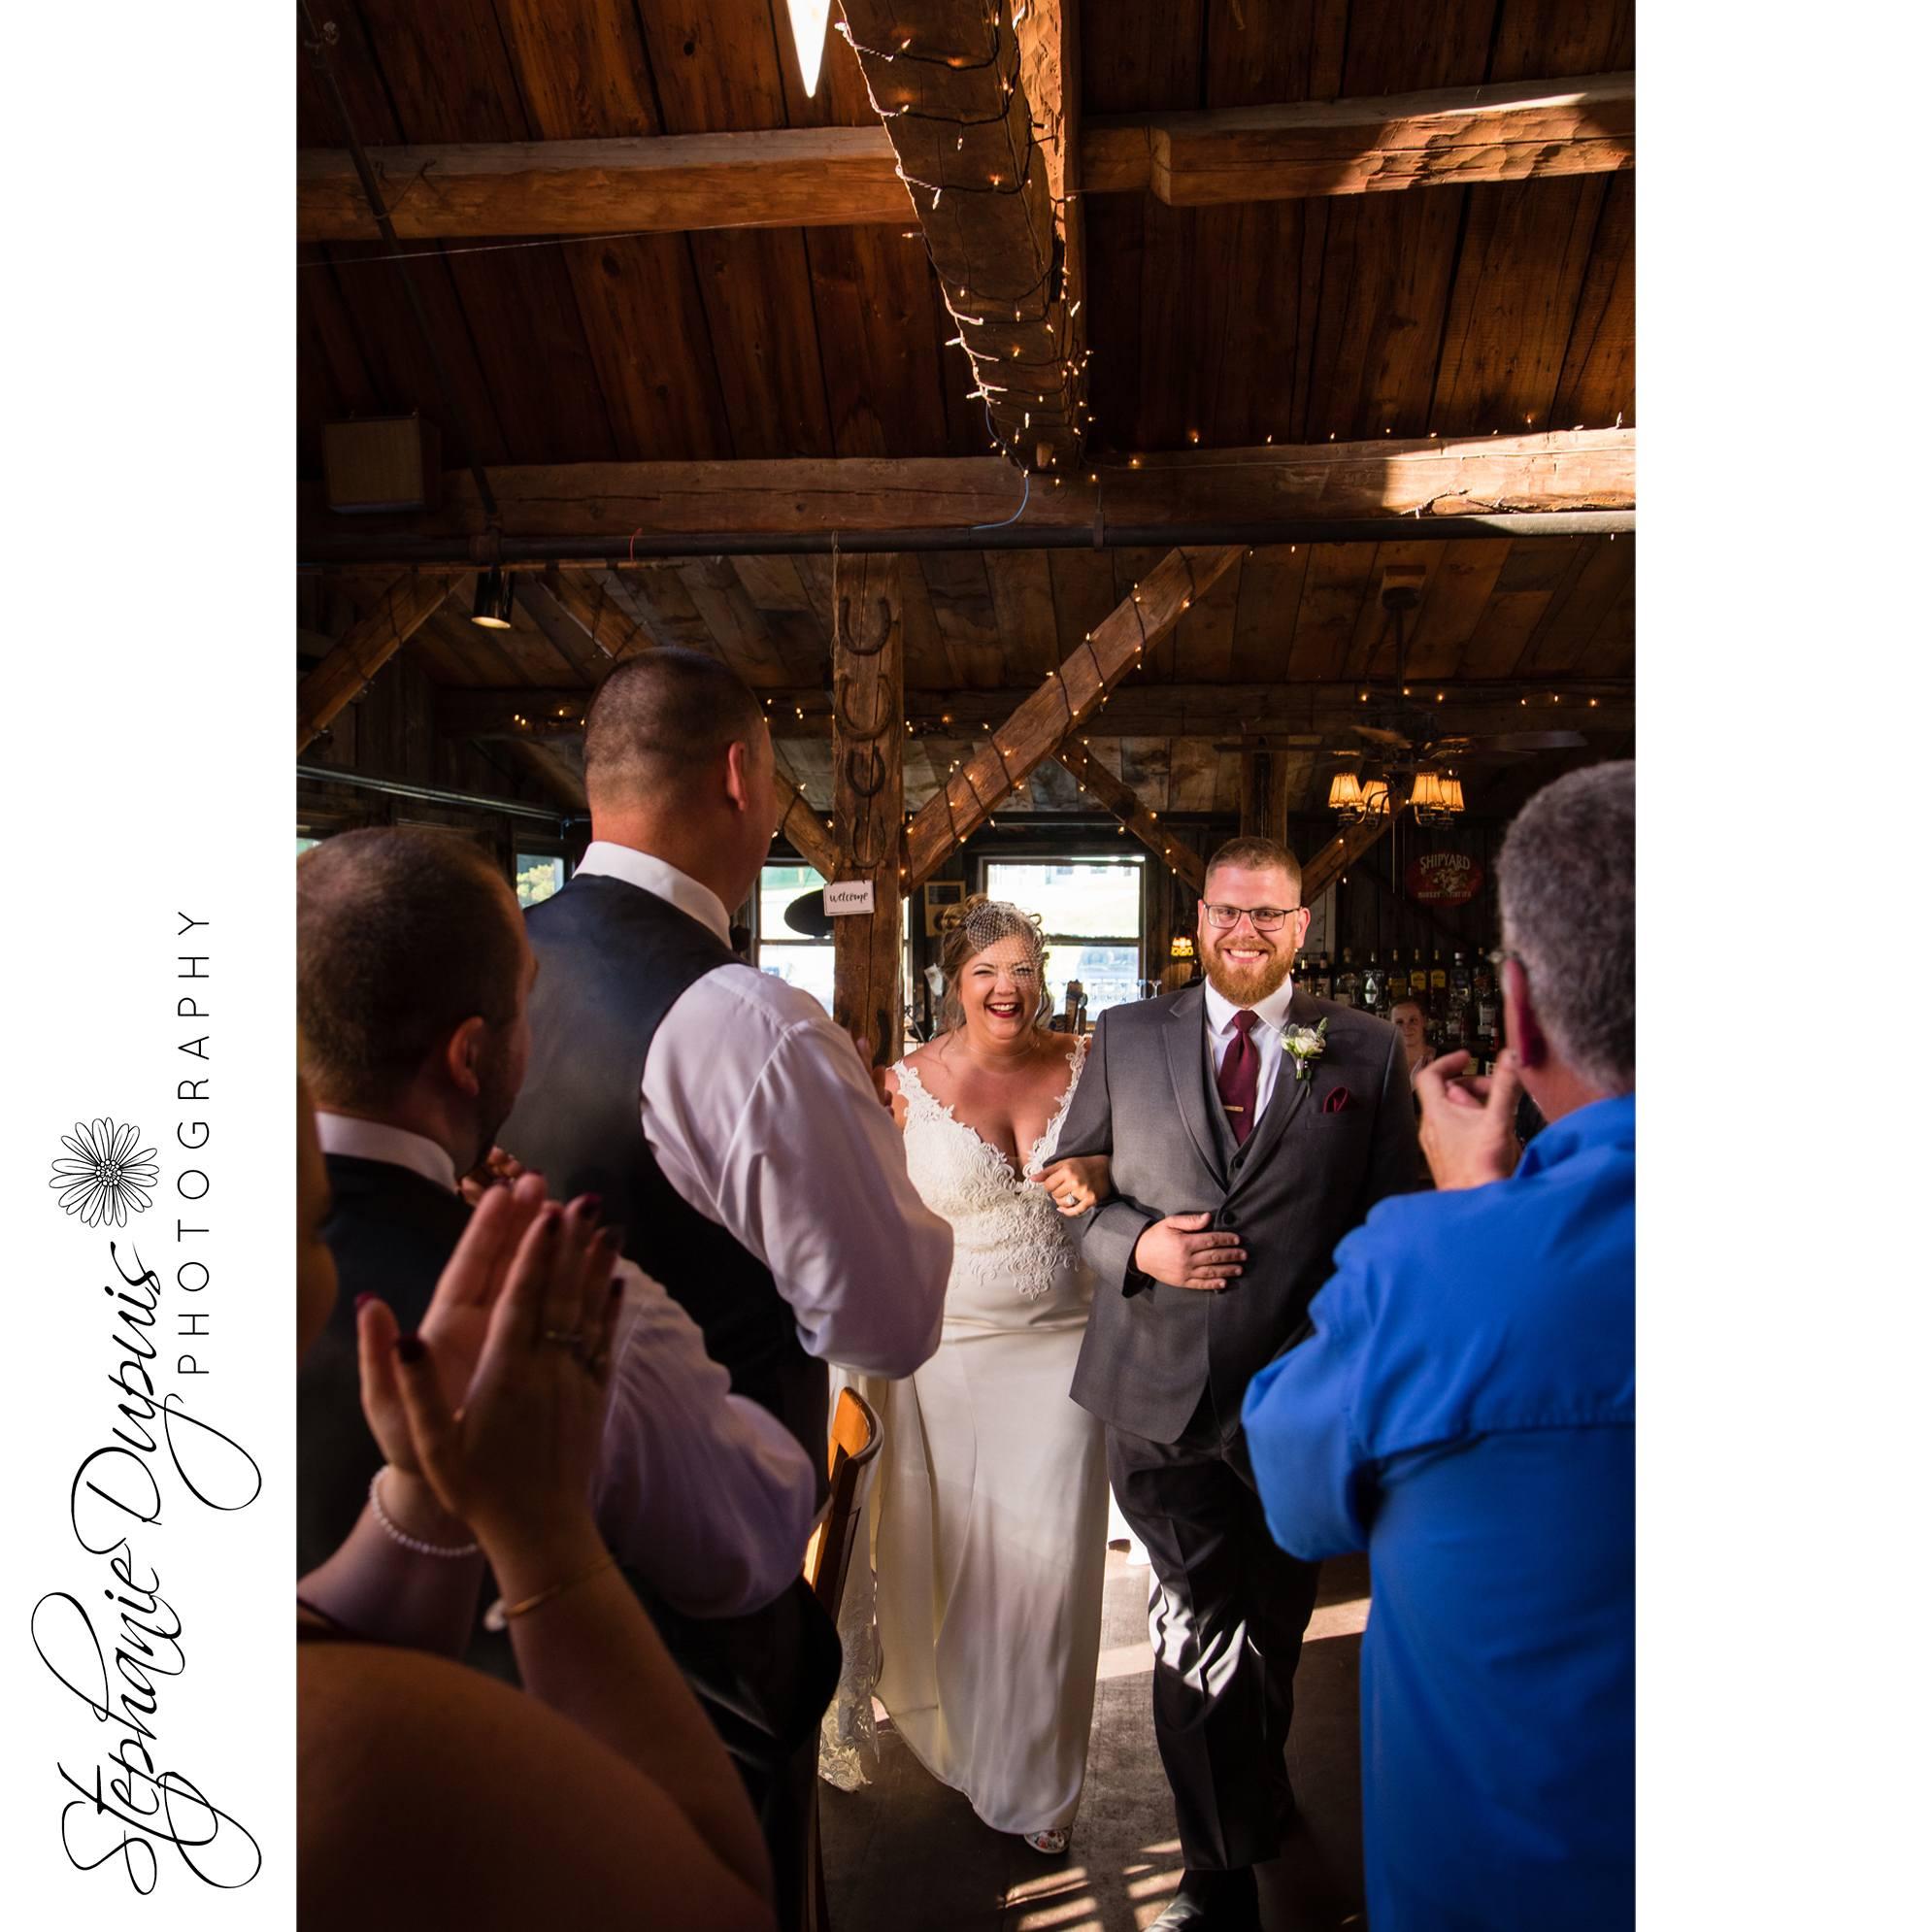 Pushee 21 1 - Portfolio: Pushee Wedding